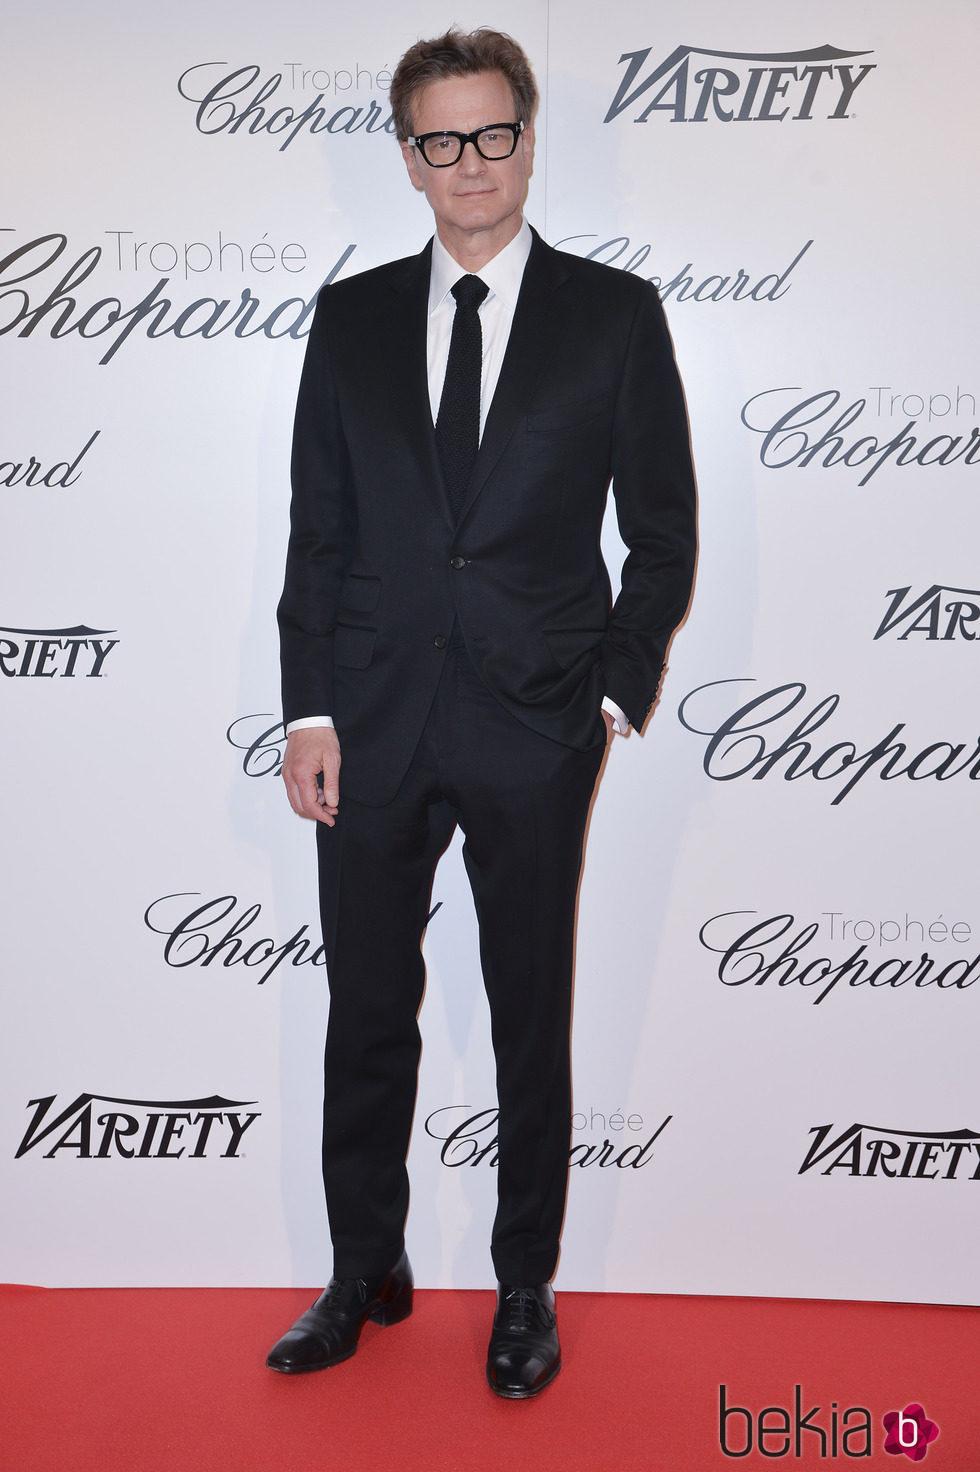 Colin Firth en la gala Trofeo Chopard del Festival de Cannes 2015